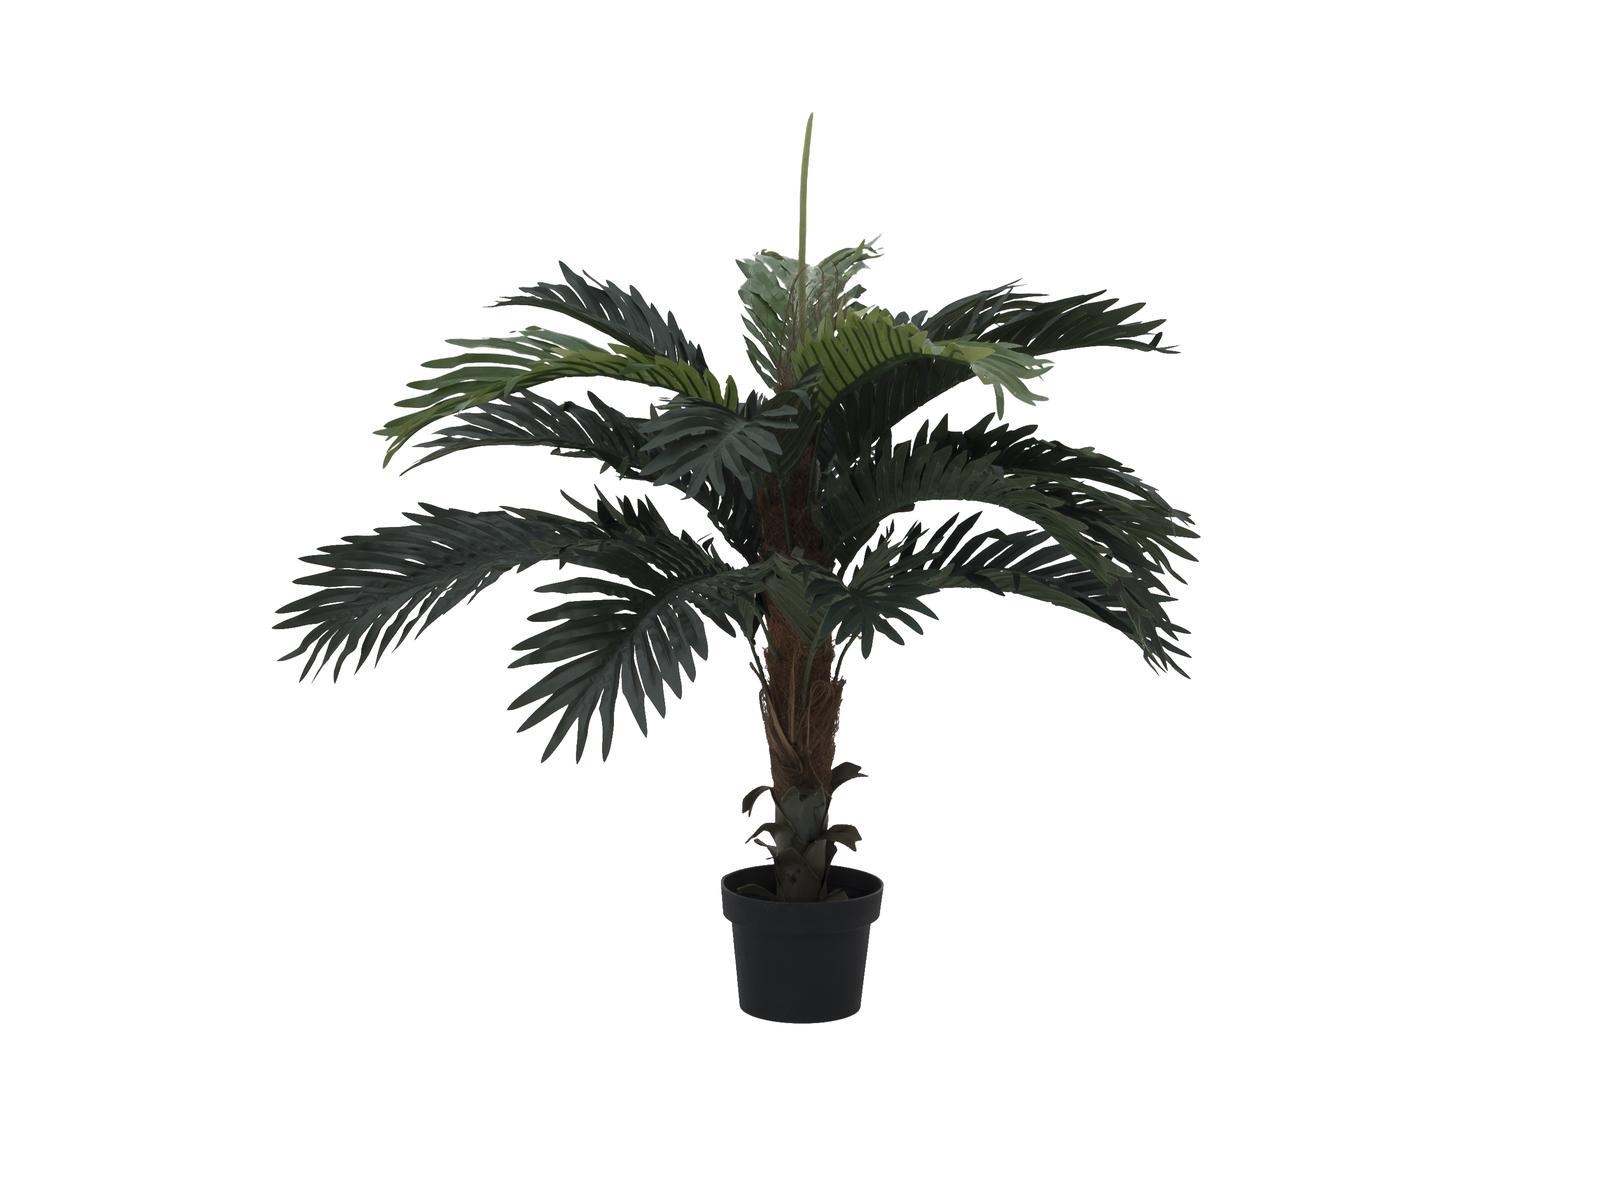 europalms-kokospalme-90cm-kunststoff